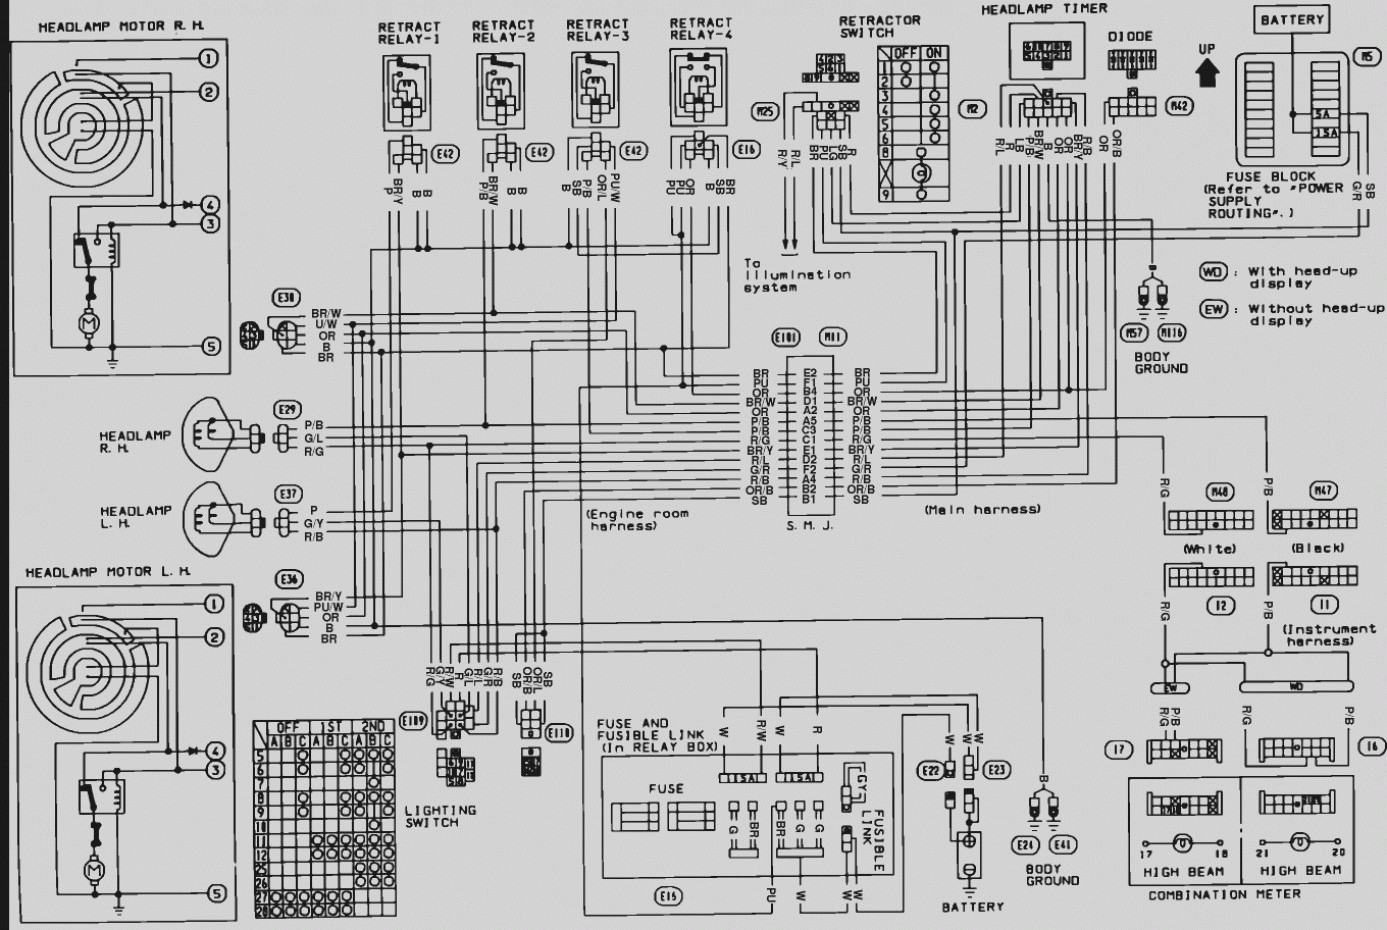 Time Bomb Circuit Diagram Awesome 1995 240sx Fuse Box